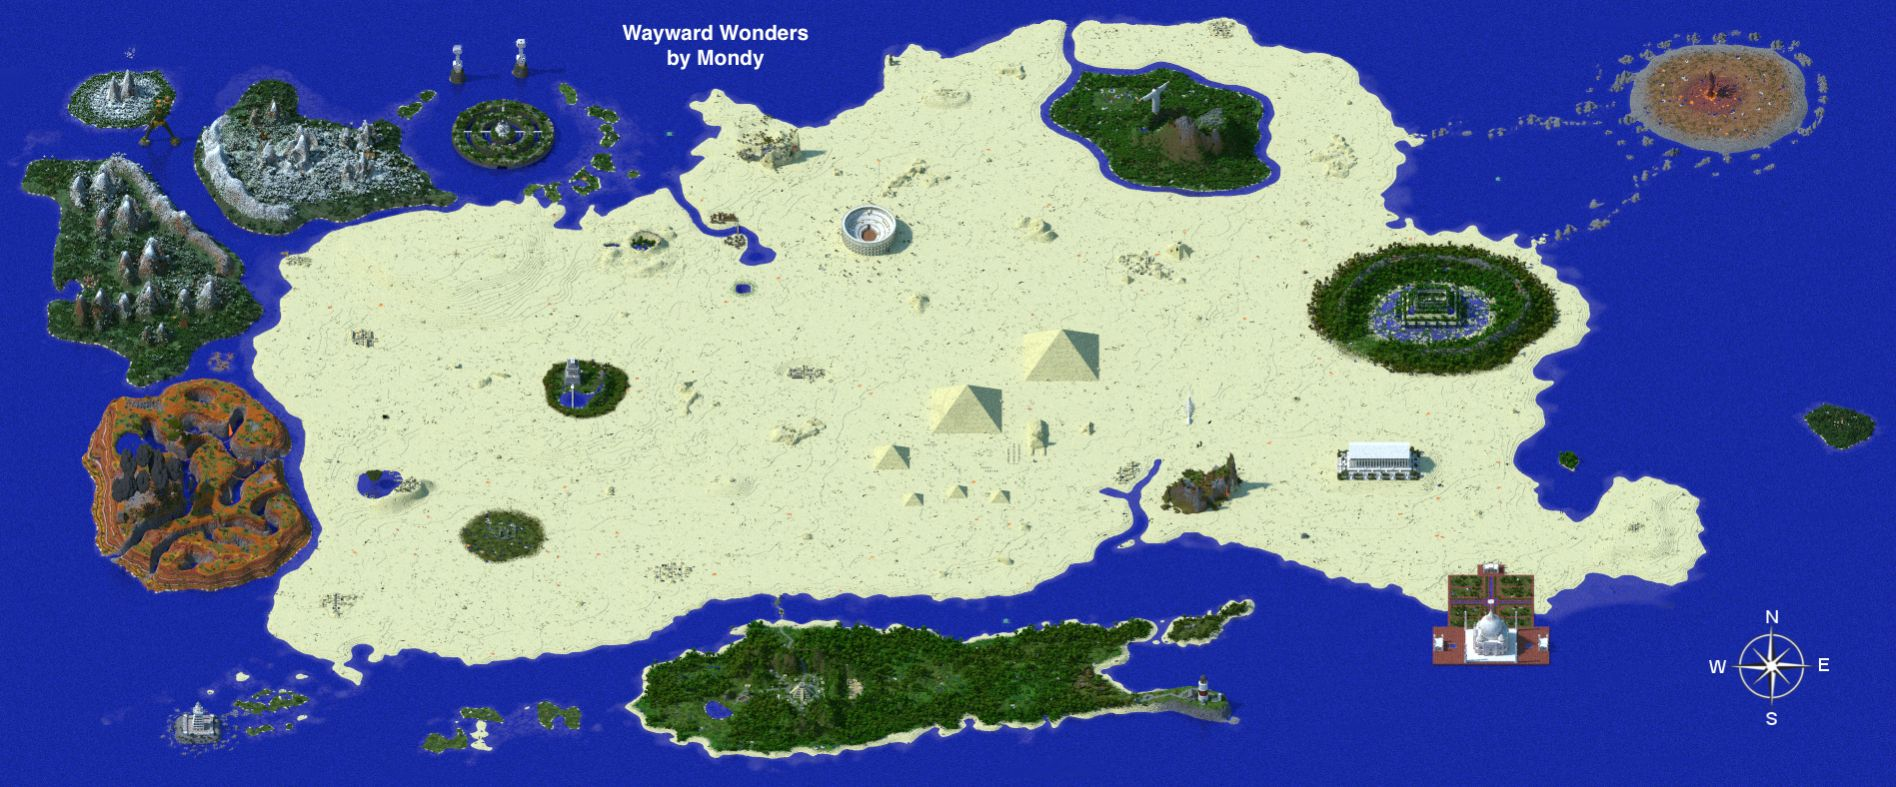 Wayward Wonders CTM Map Download for Minecraft 183